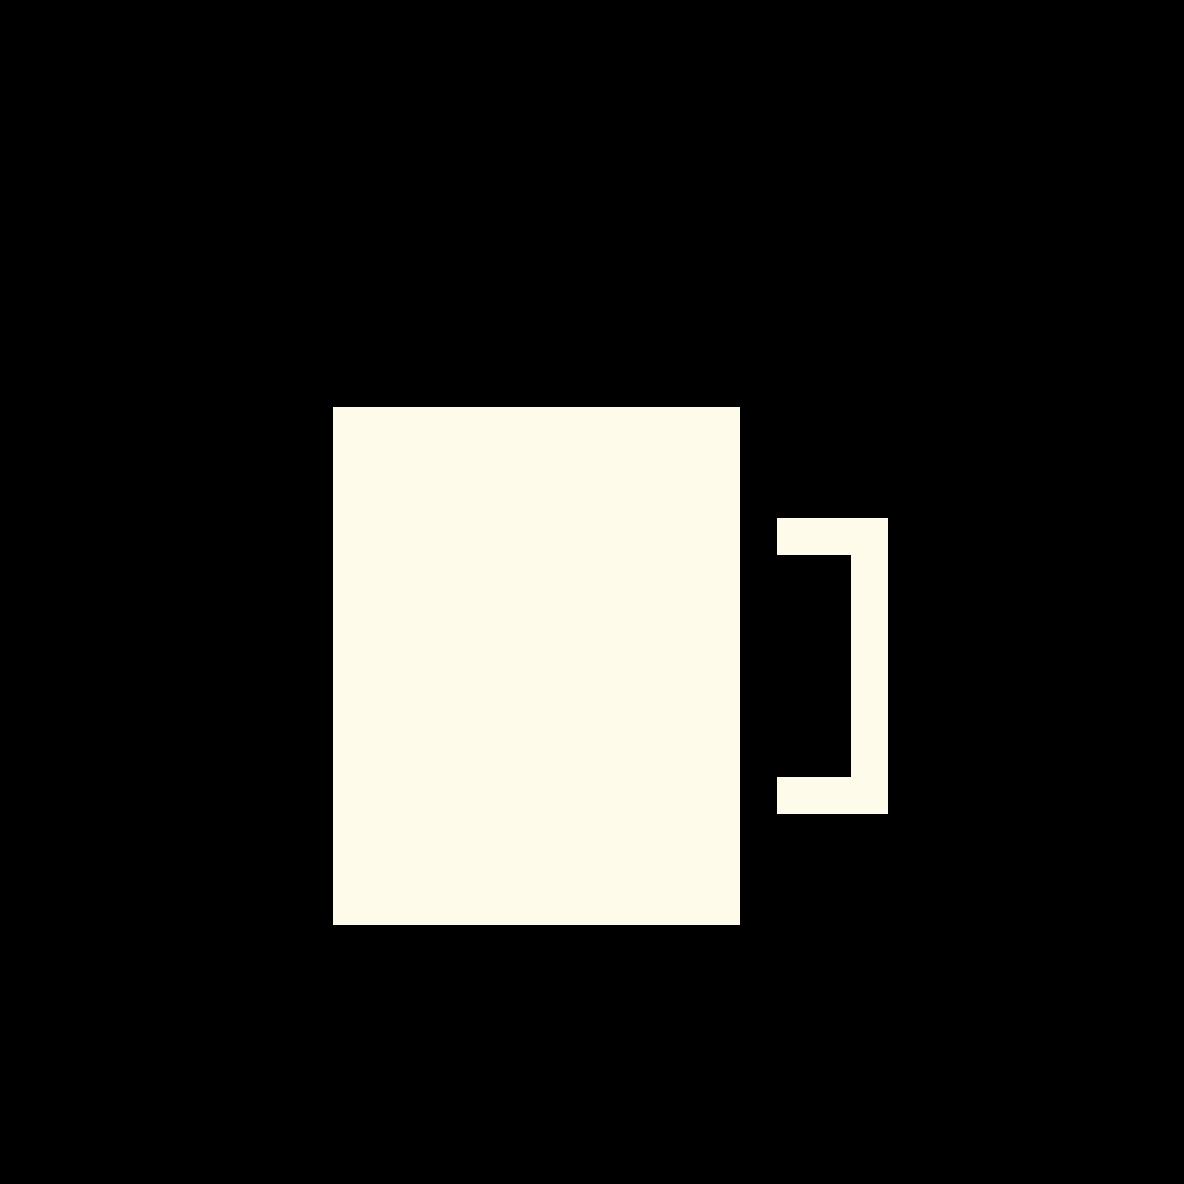 Mug by KillerScythe